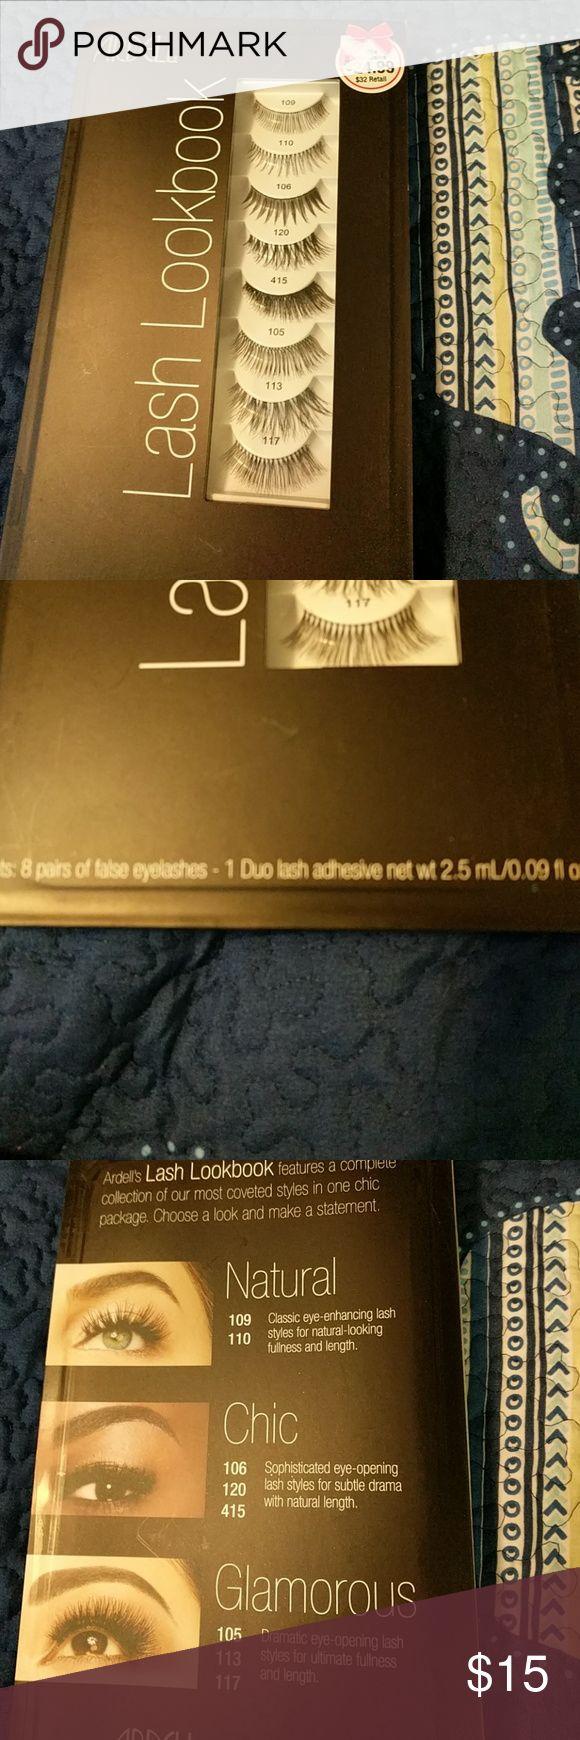 Ardell Lash Look book 8 pairs of lashes and adhesive. Nwt Ardell Makeup False Eyelashes